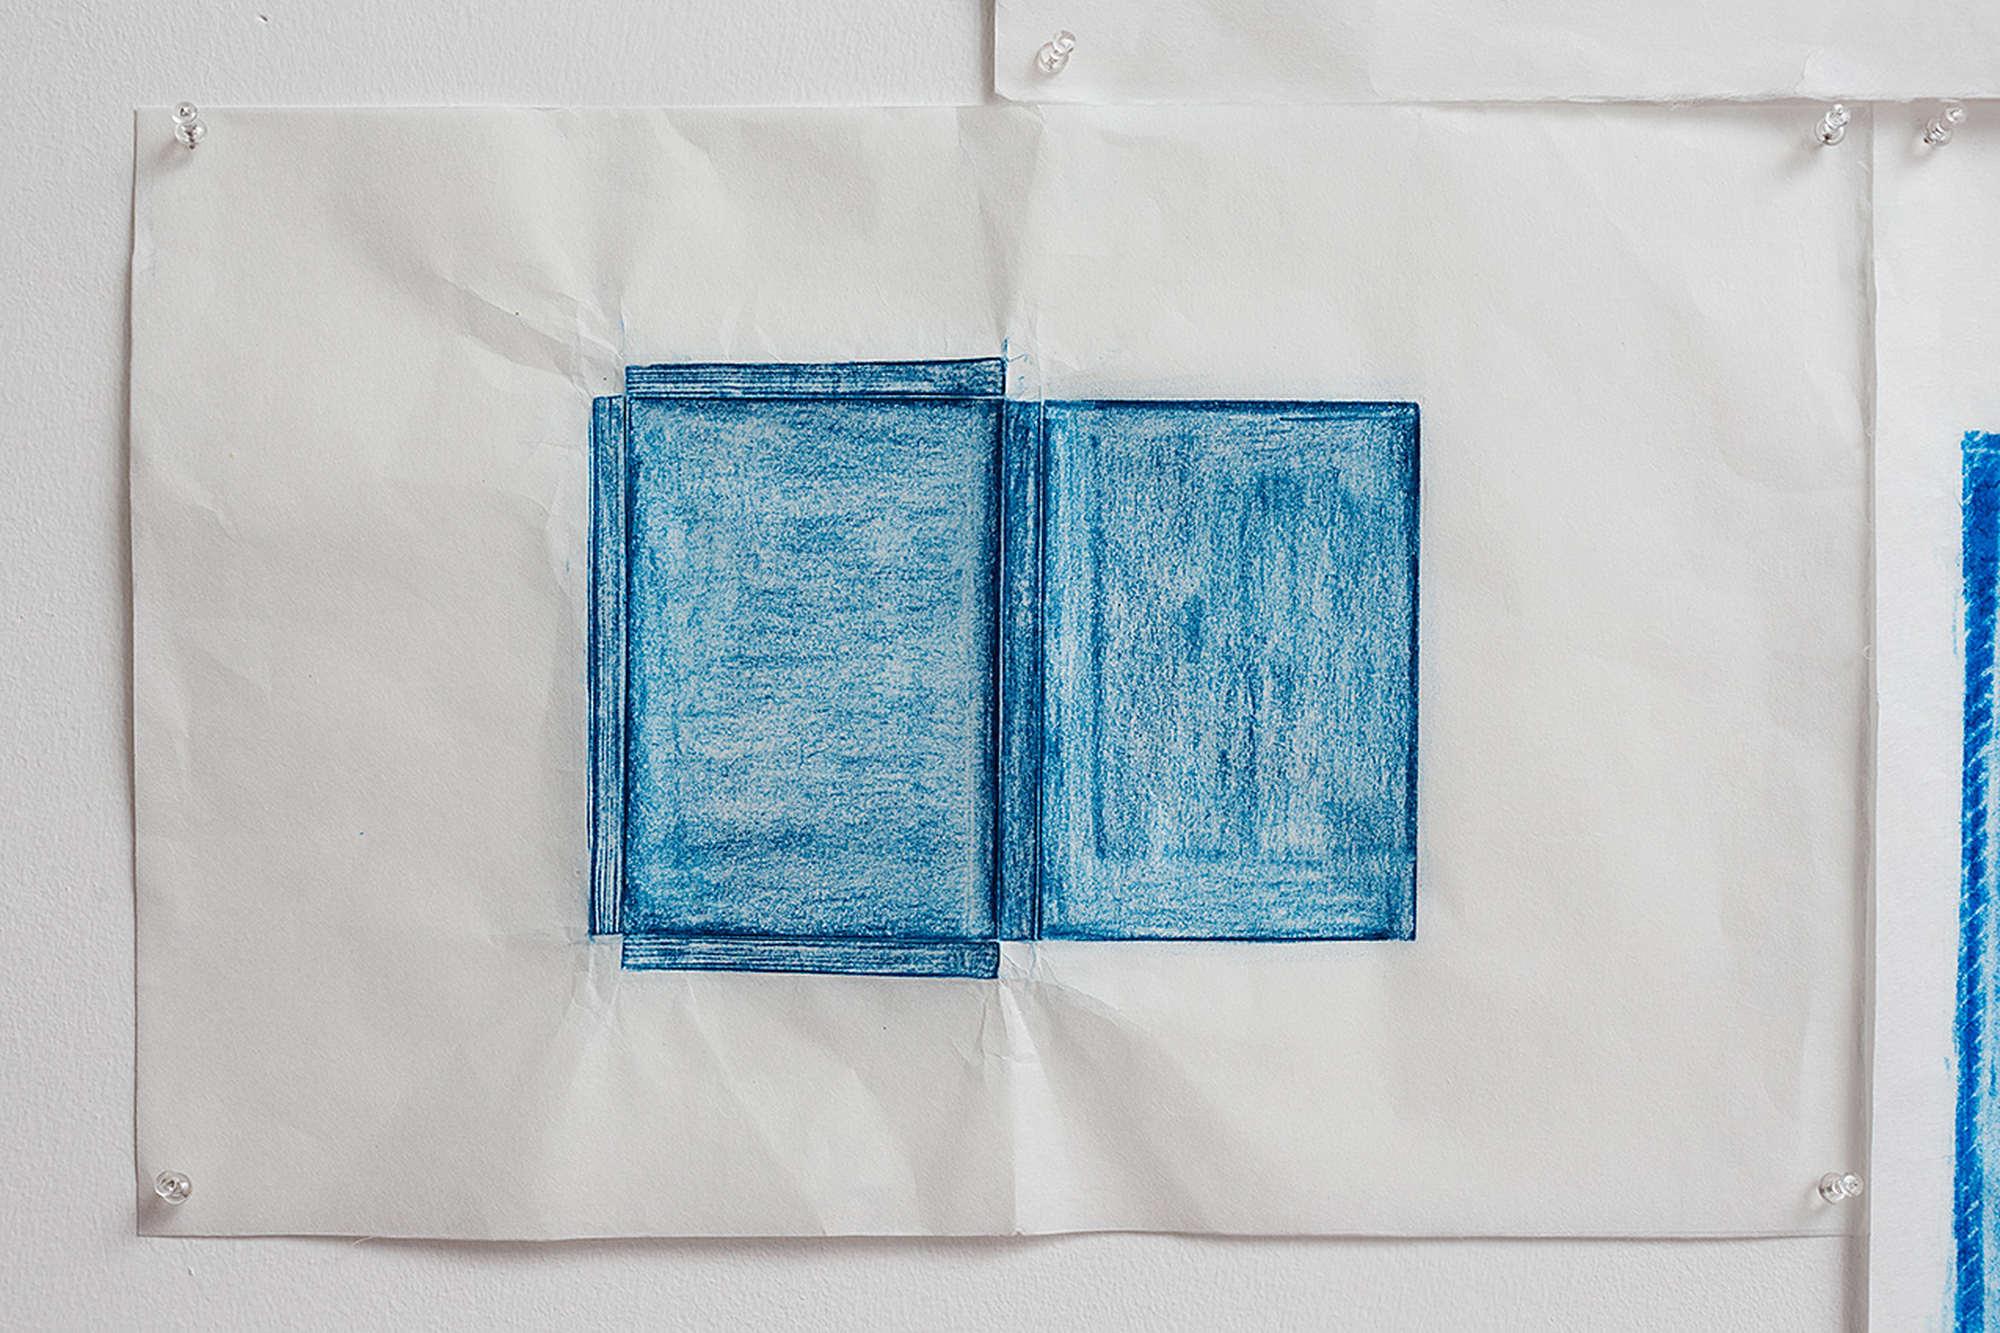 Jennifer Bornstein, Printed Matter, rubbing (encaustic and wax on Kozo paper), 49 x 64 cm, unique